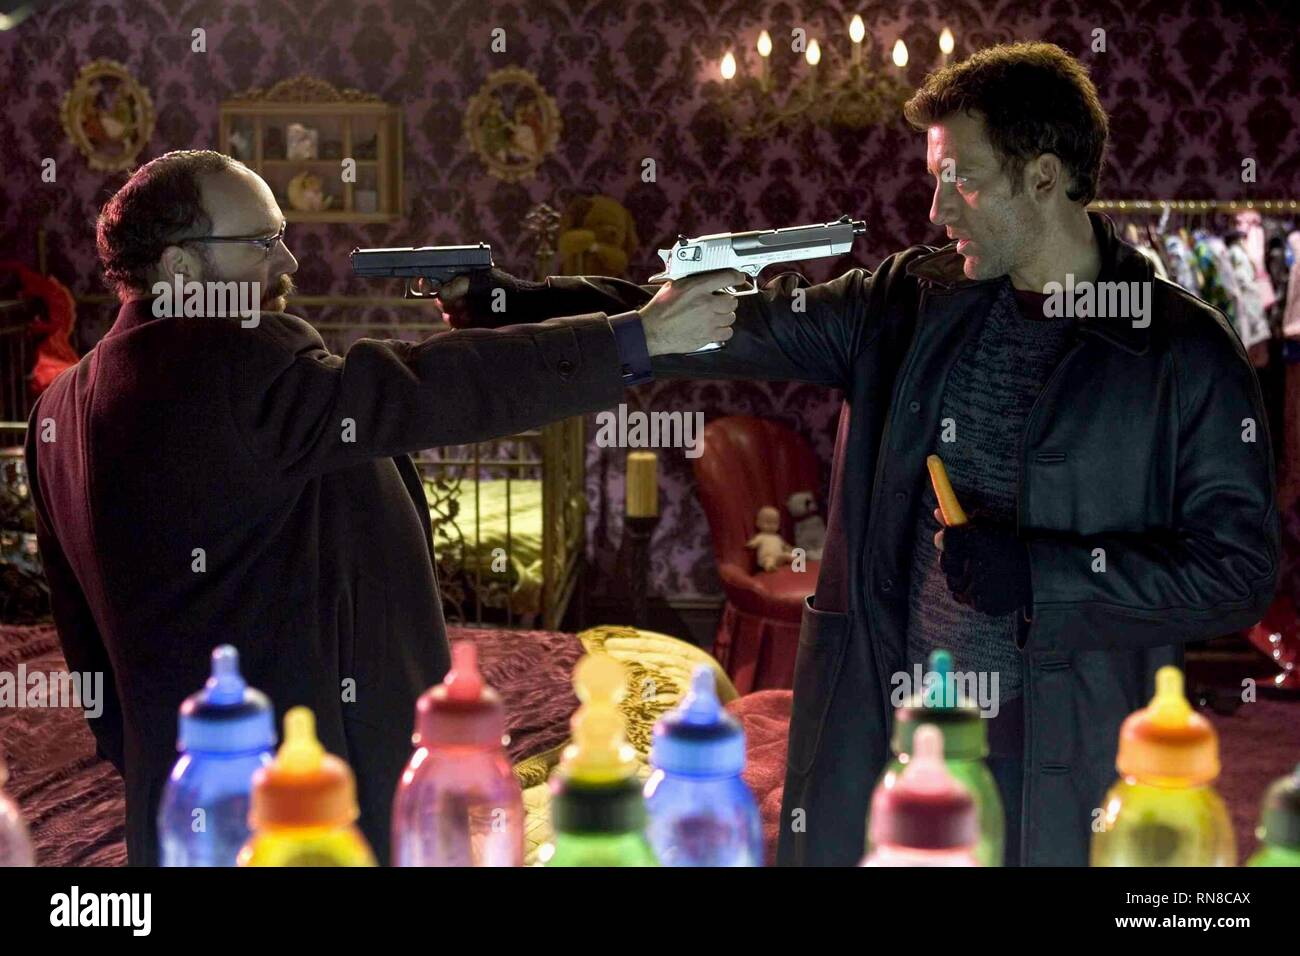 SHOOT 'EM UP, PAUL GIAMATTI , CLIVE OWEN, 2007 - Stock Image